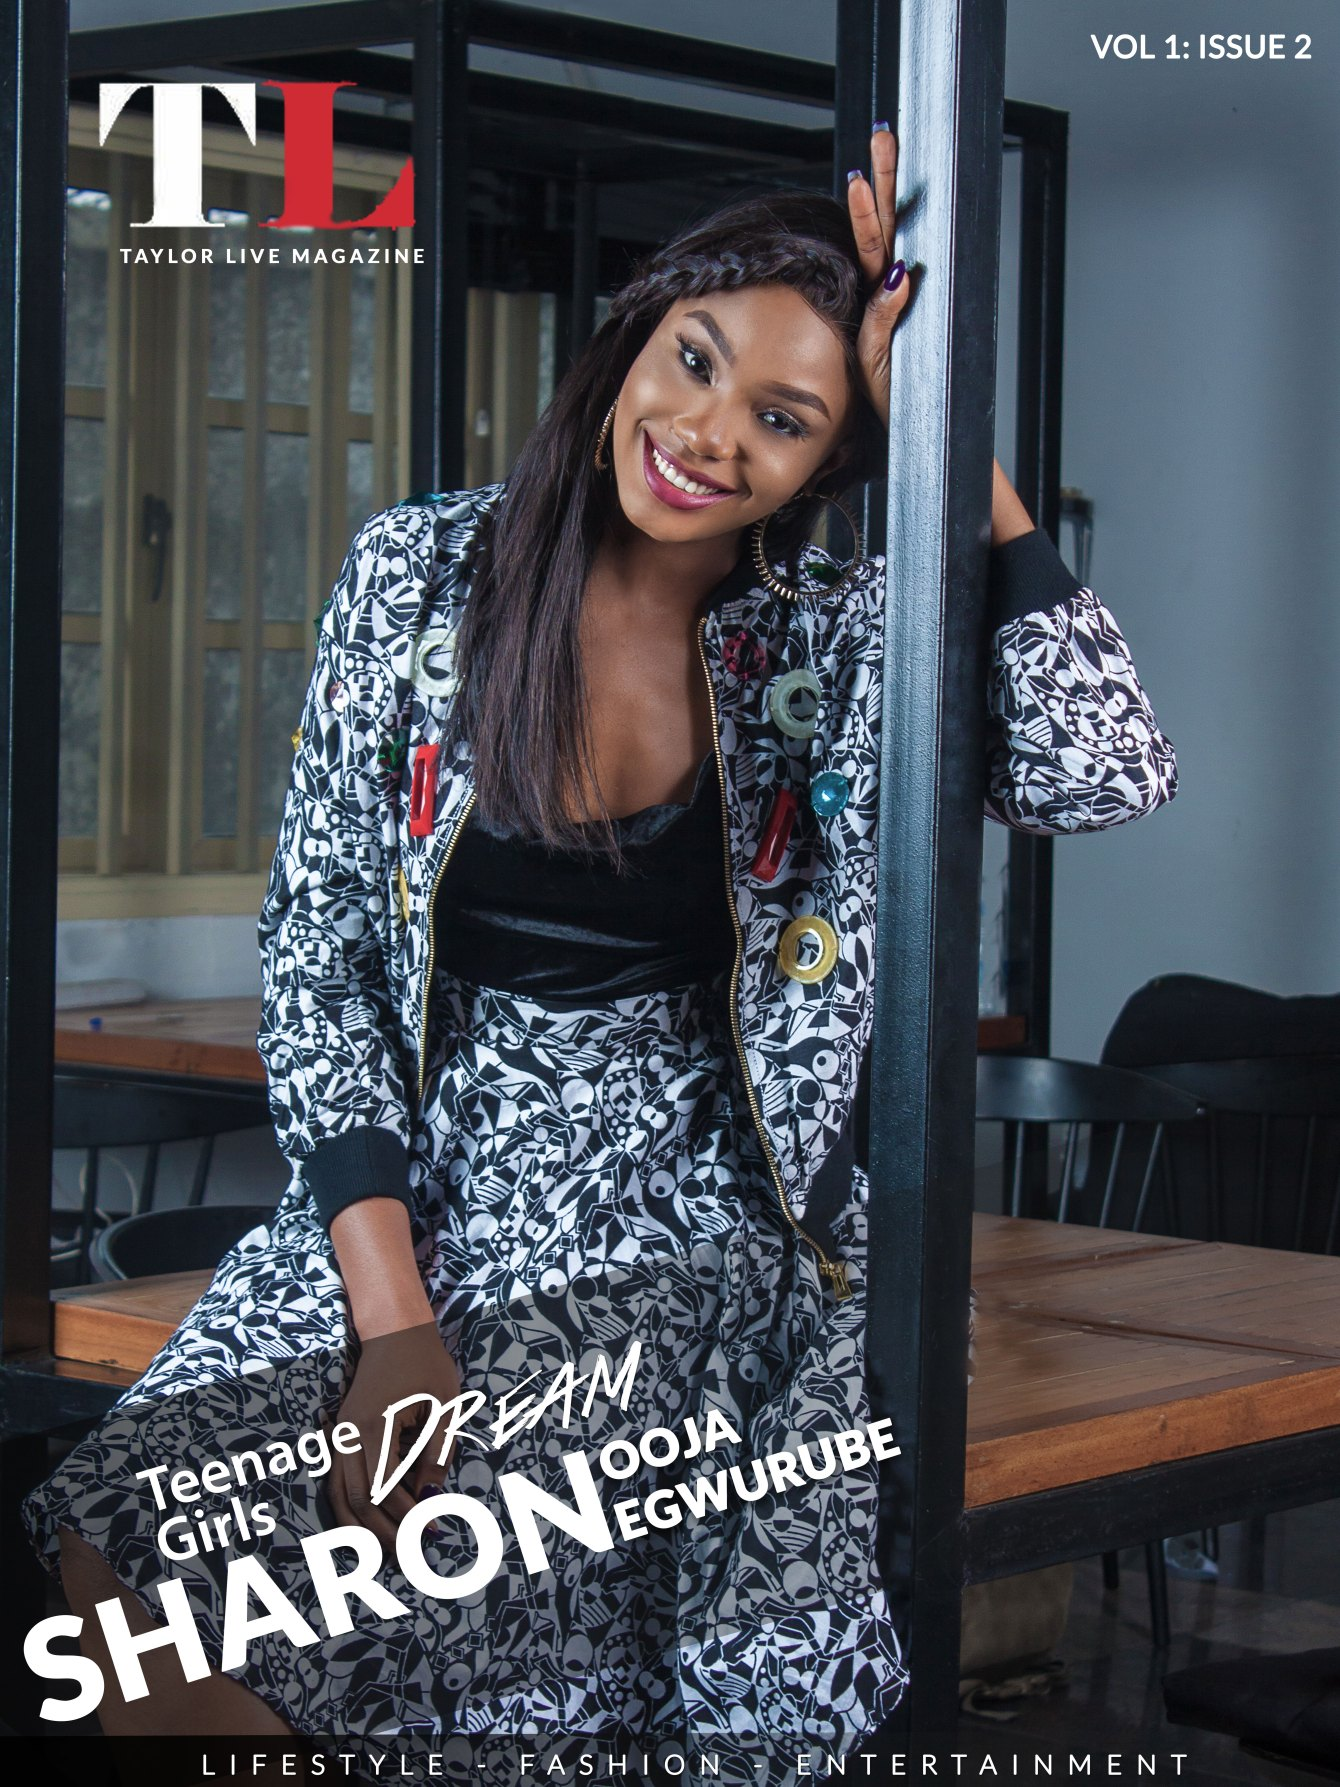 TL Magazine Cover Star Sharon Ooja Egwurube Teenage Girls Dream